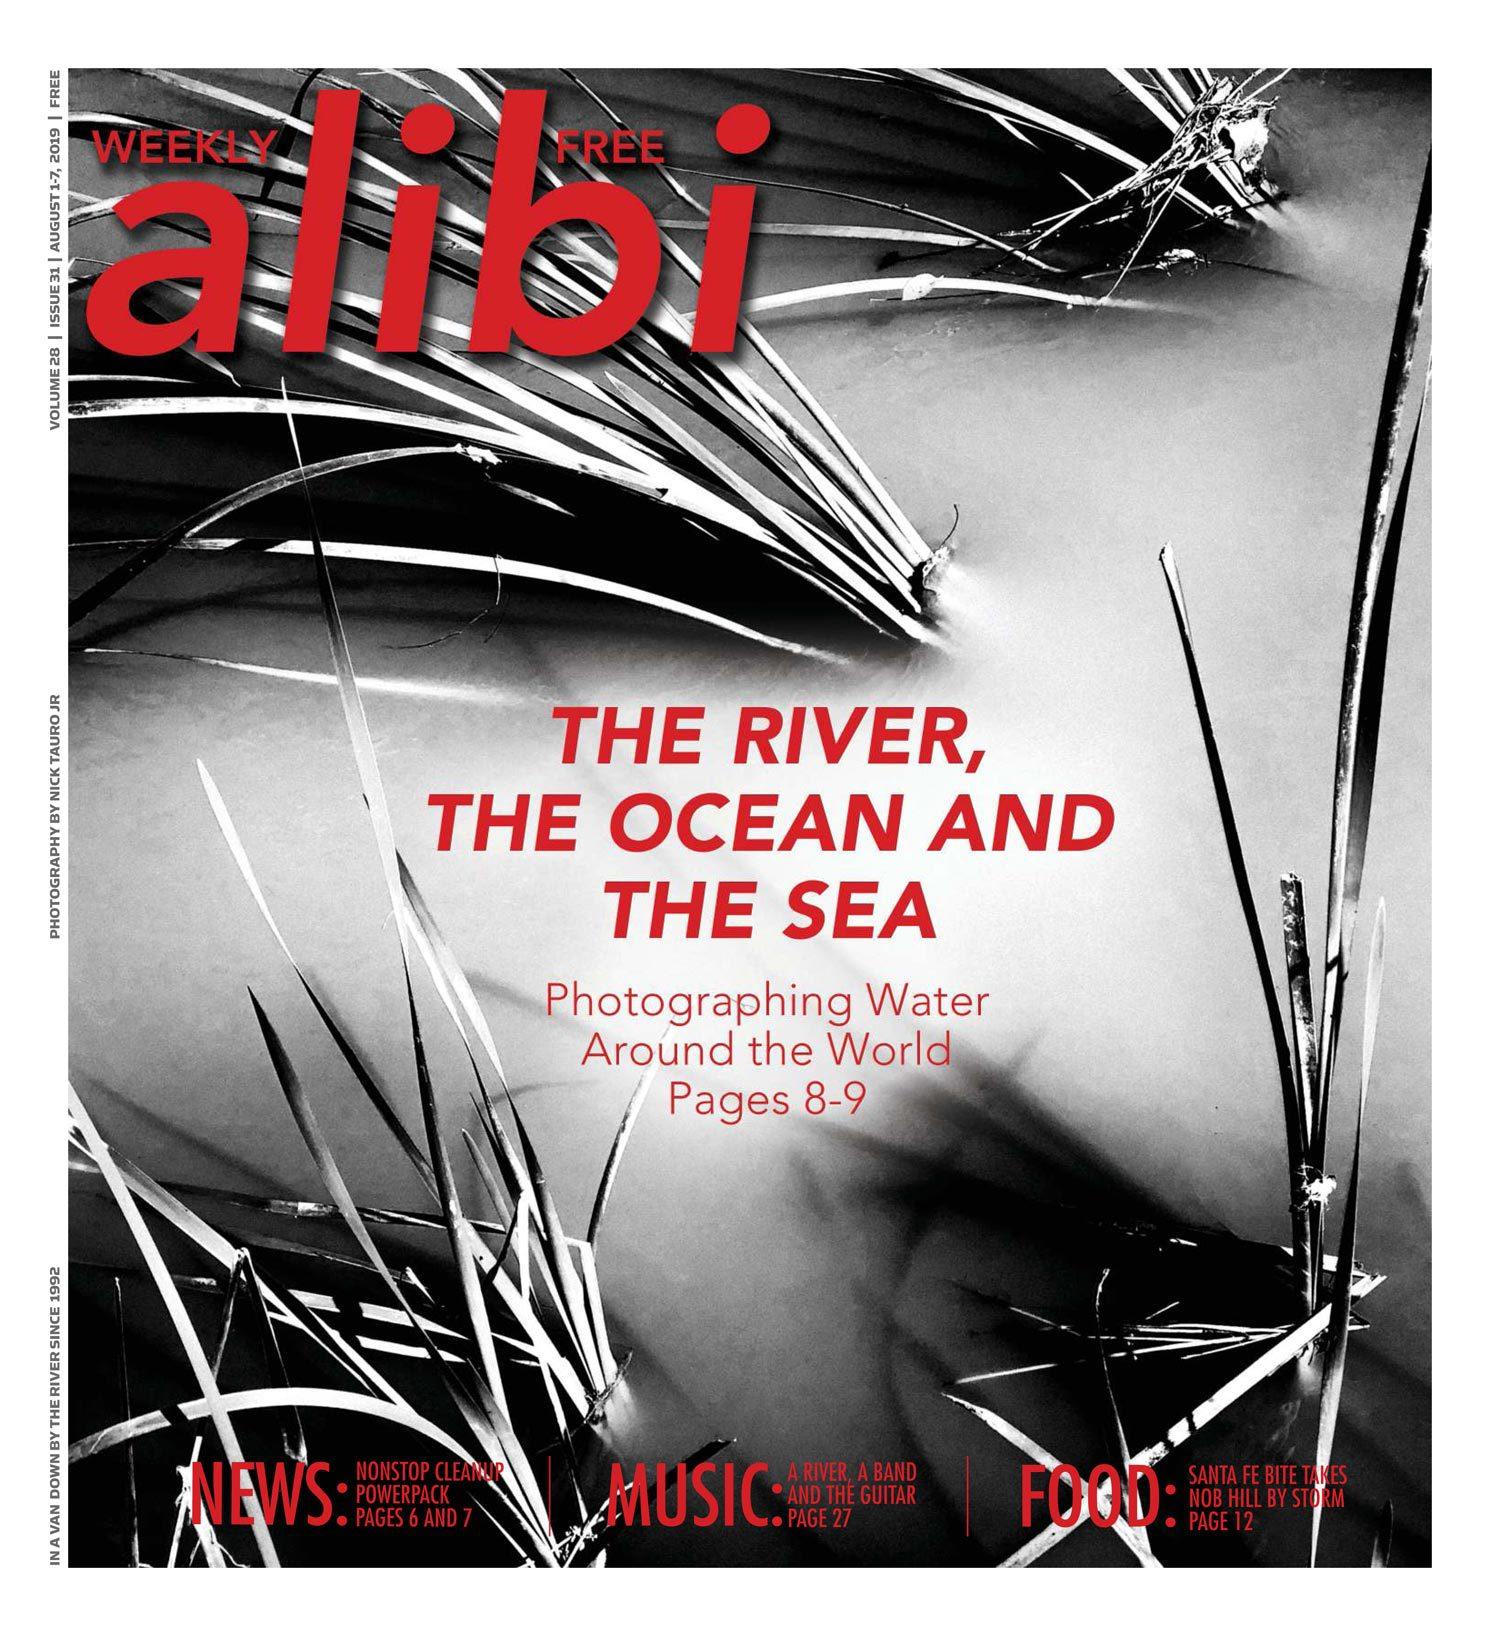 Alibi v28 i31 cover.jpg